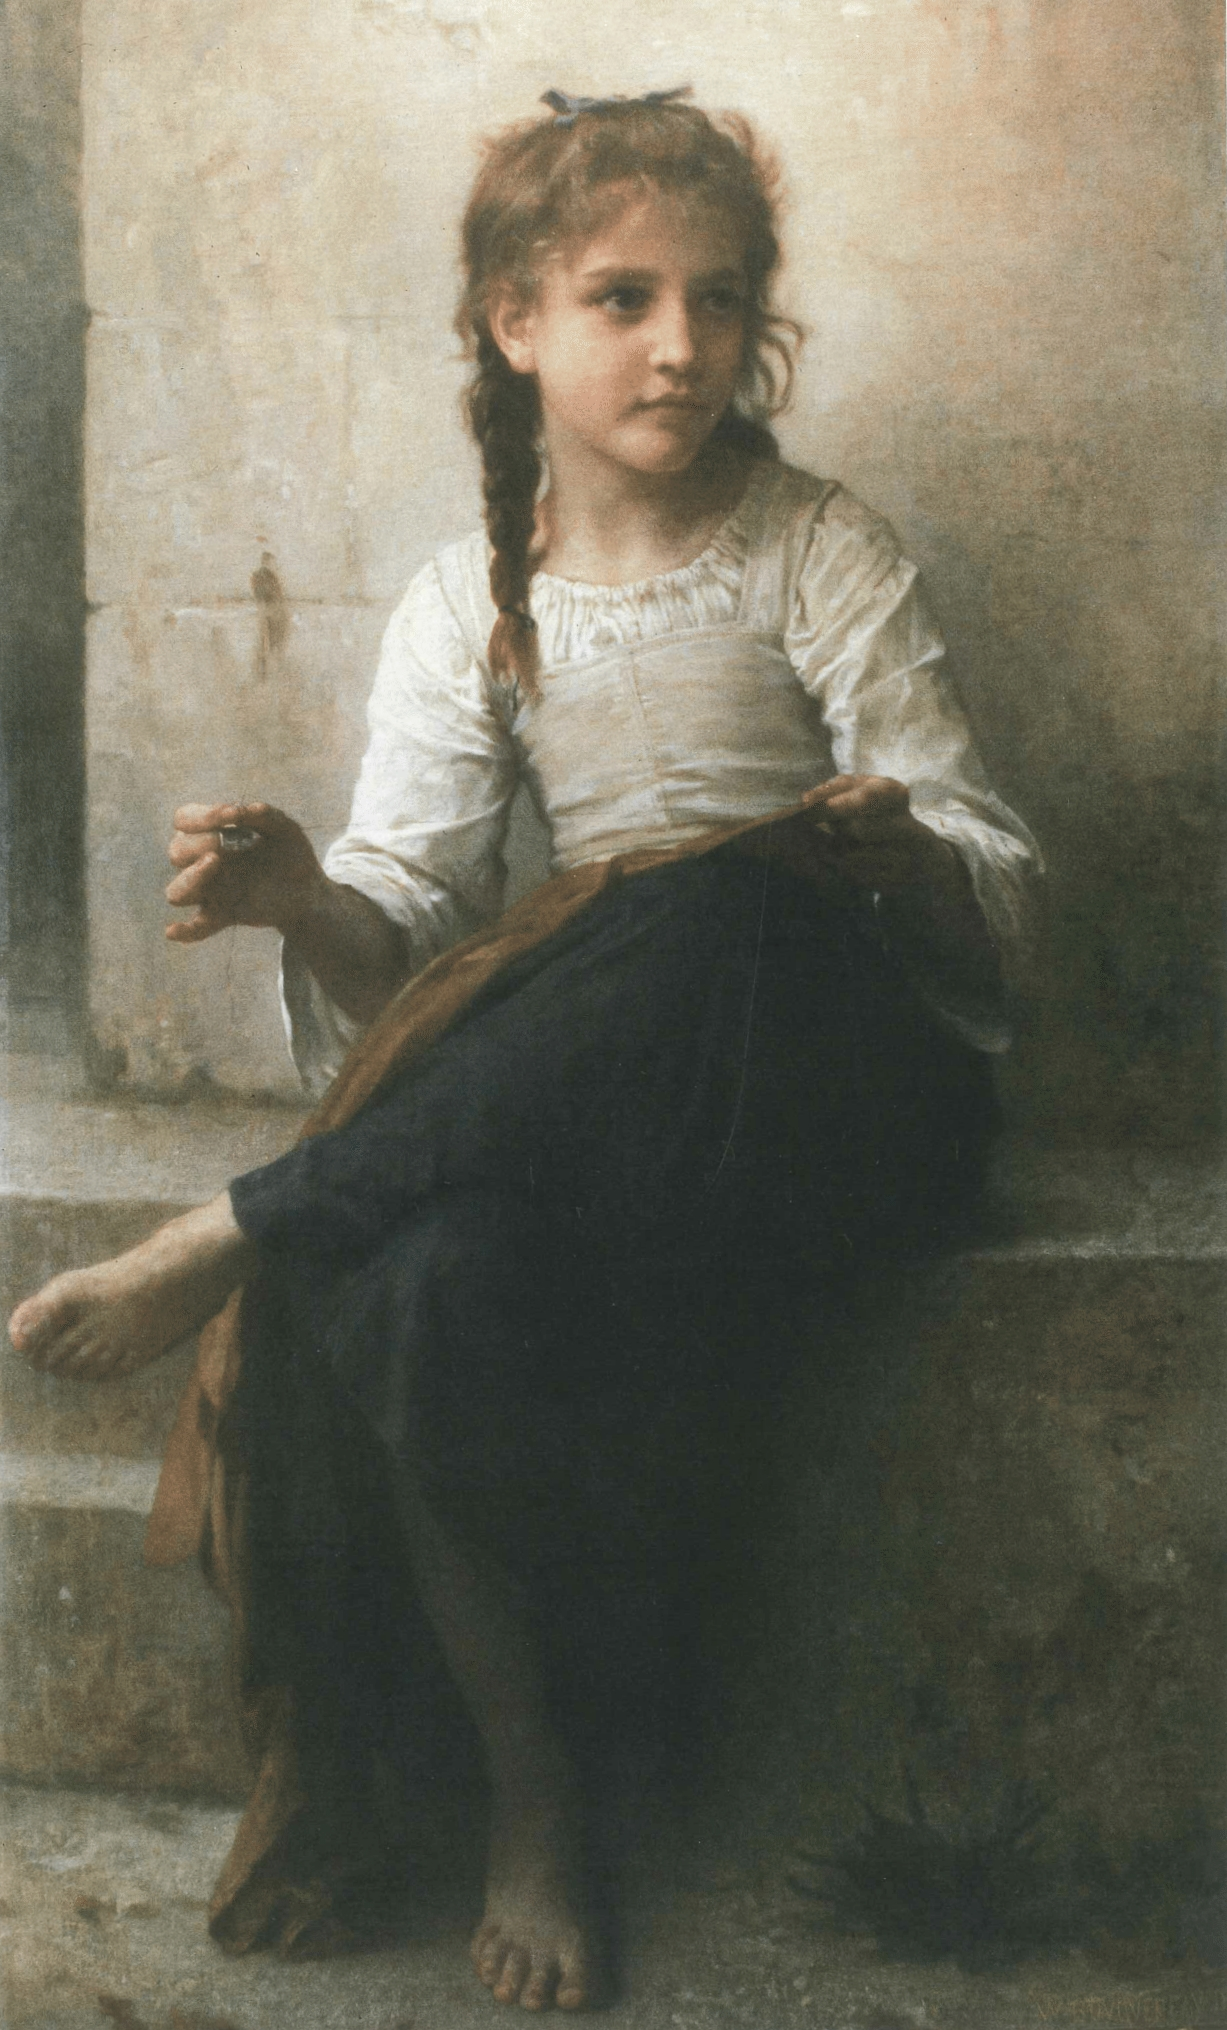 https://upload.wikimedia.org/wikipedia/commons/d/de/William-Adolphe_Bouguereau_%281825-1905%29_-_The_Seamstress_%281898%29.jpg